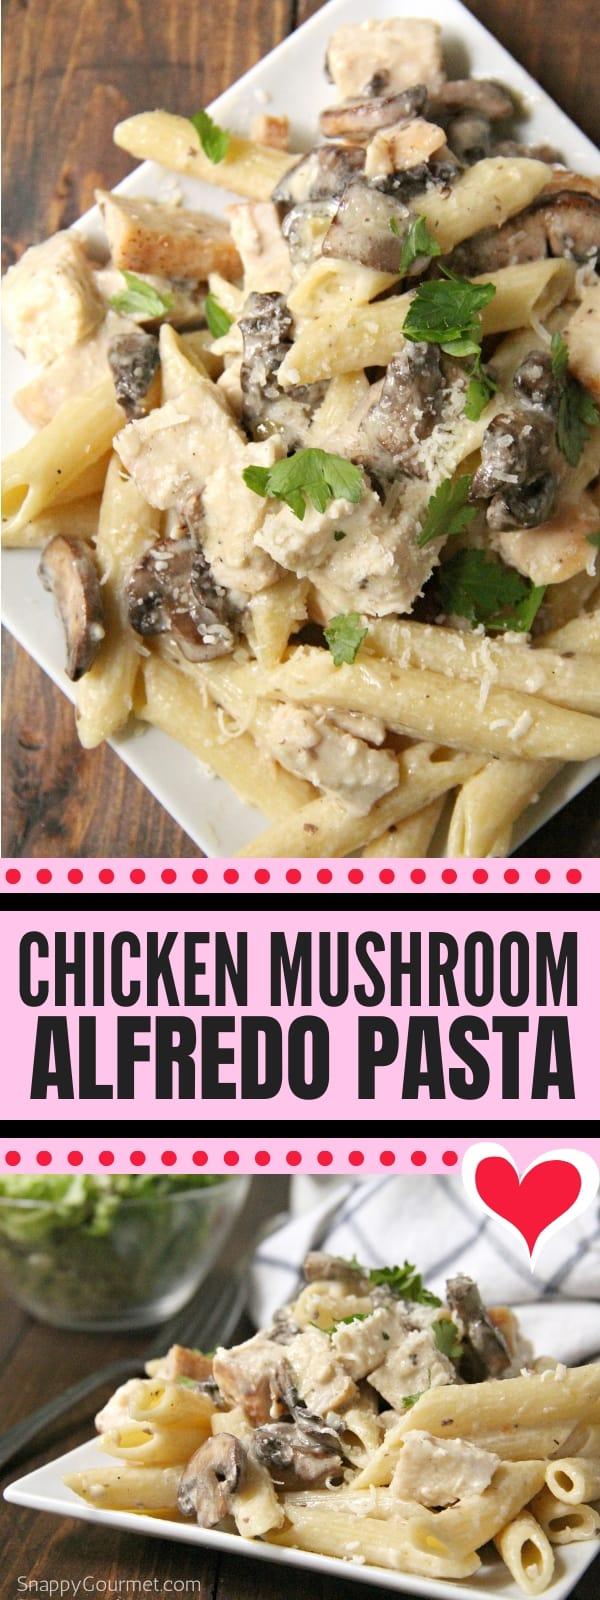 Chicken Mushroom Alfredo Pasta collage